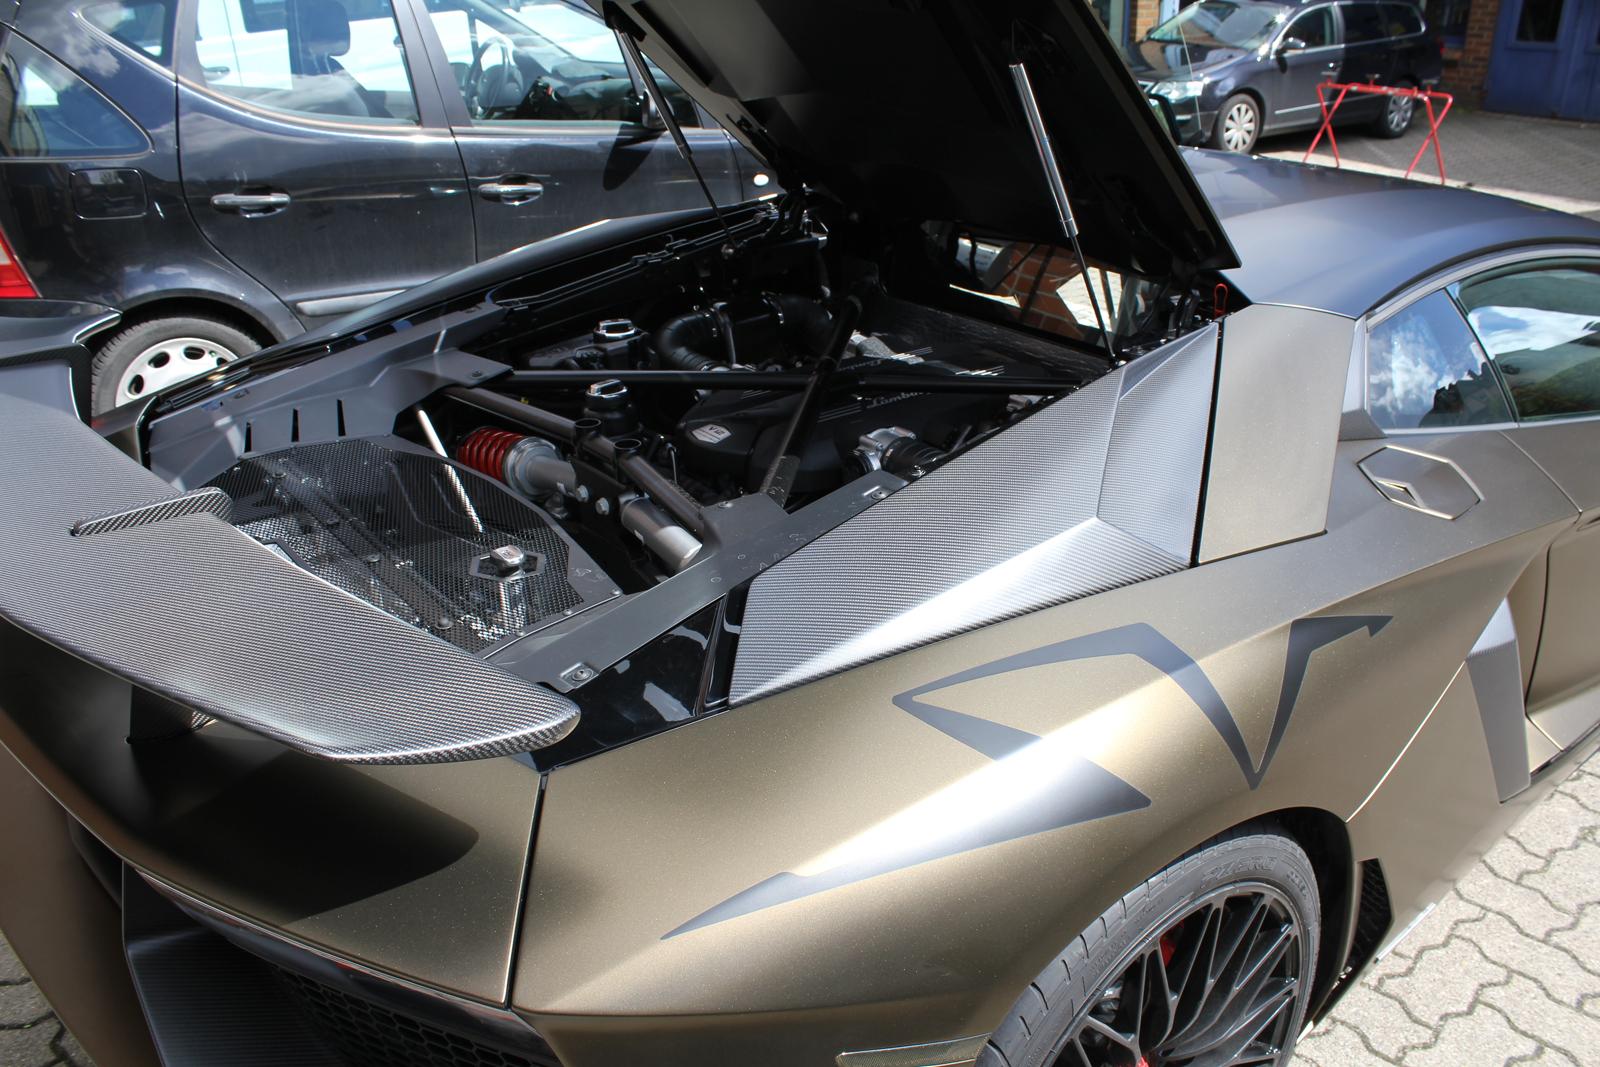 LAMBORGHINI_AVENTADOR_SV_CAR-WRAPPING_BOND_GOLD_11